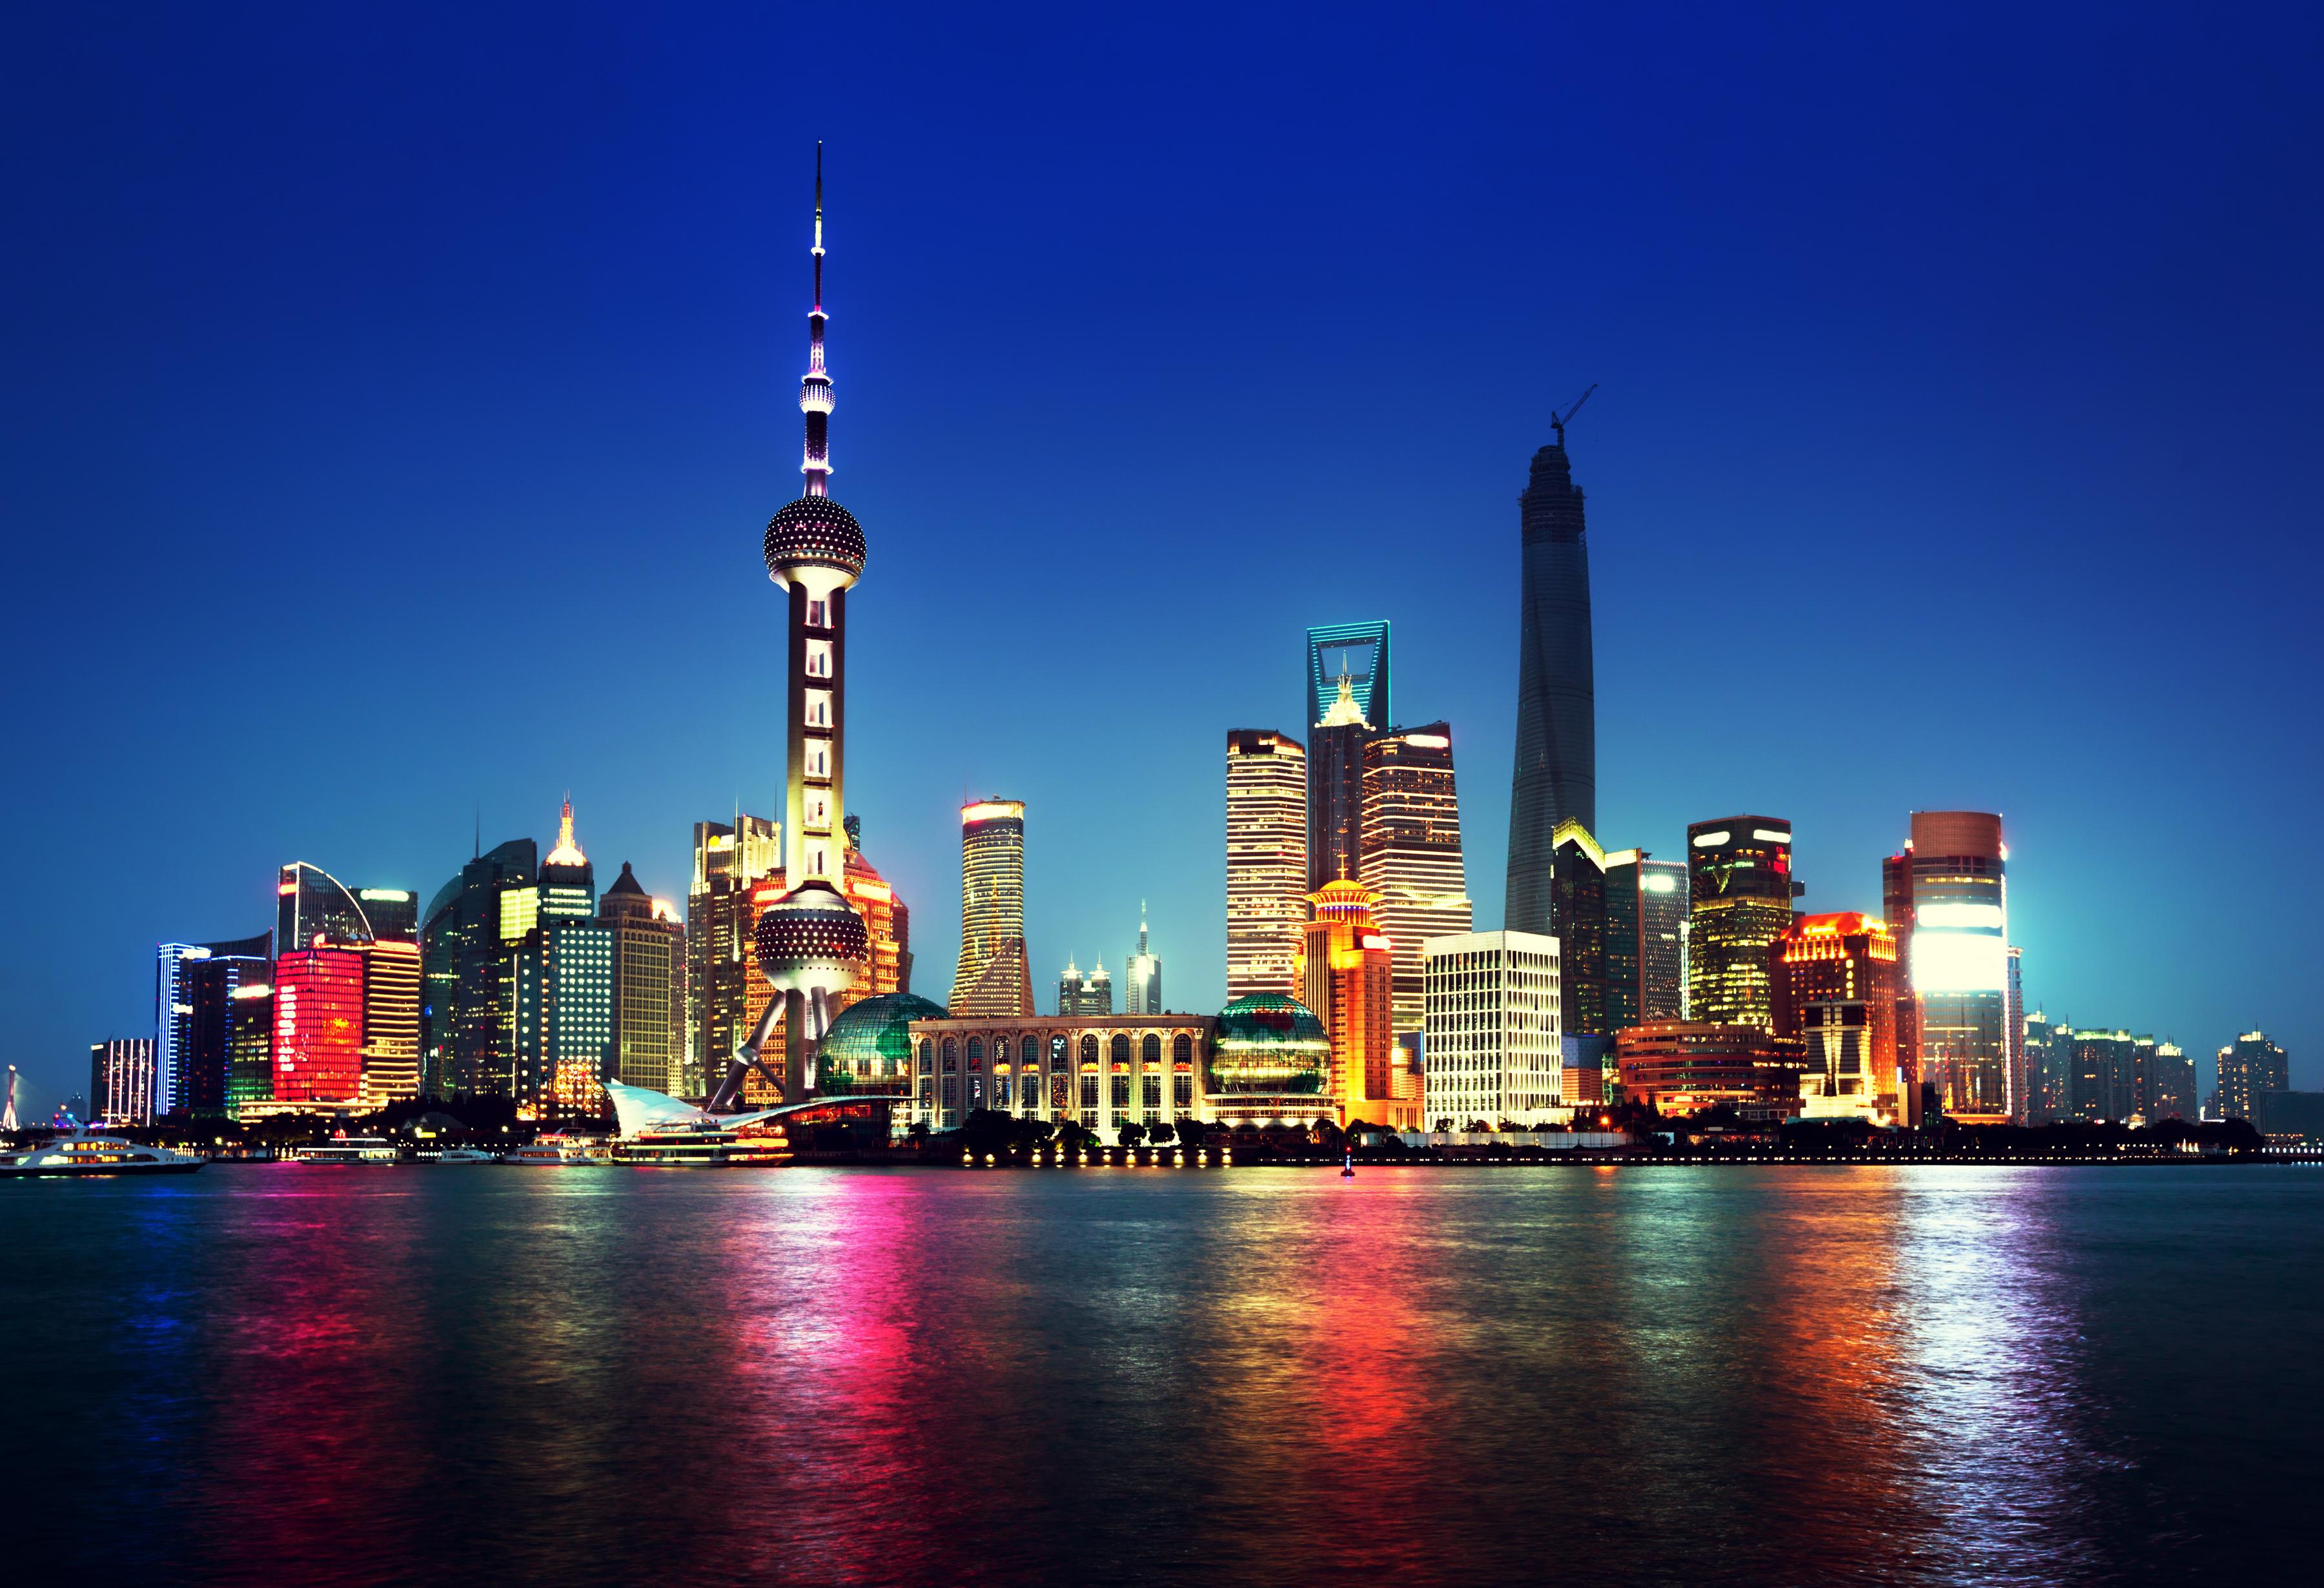 Drug Development Market Access Covance Shanghai at night, China